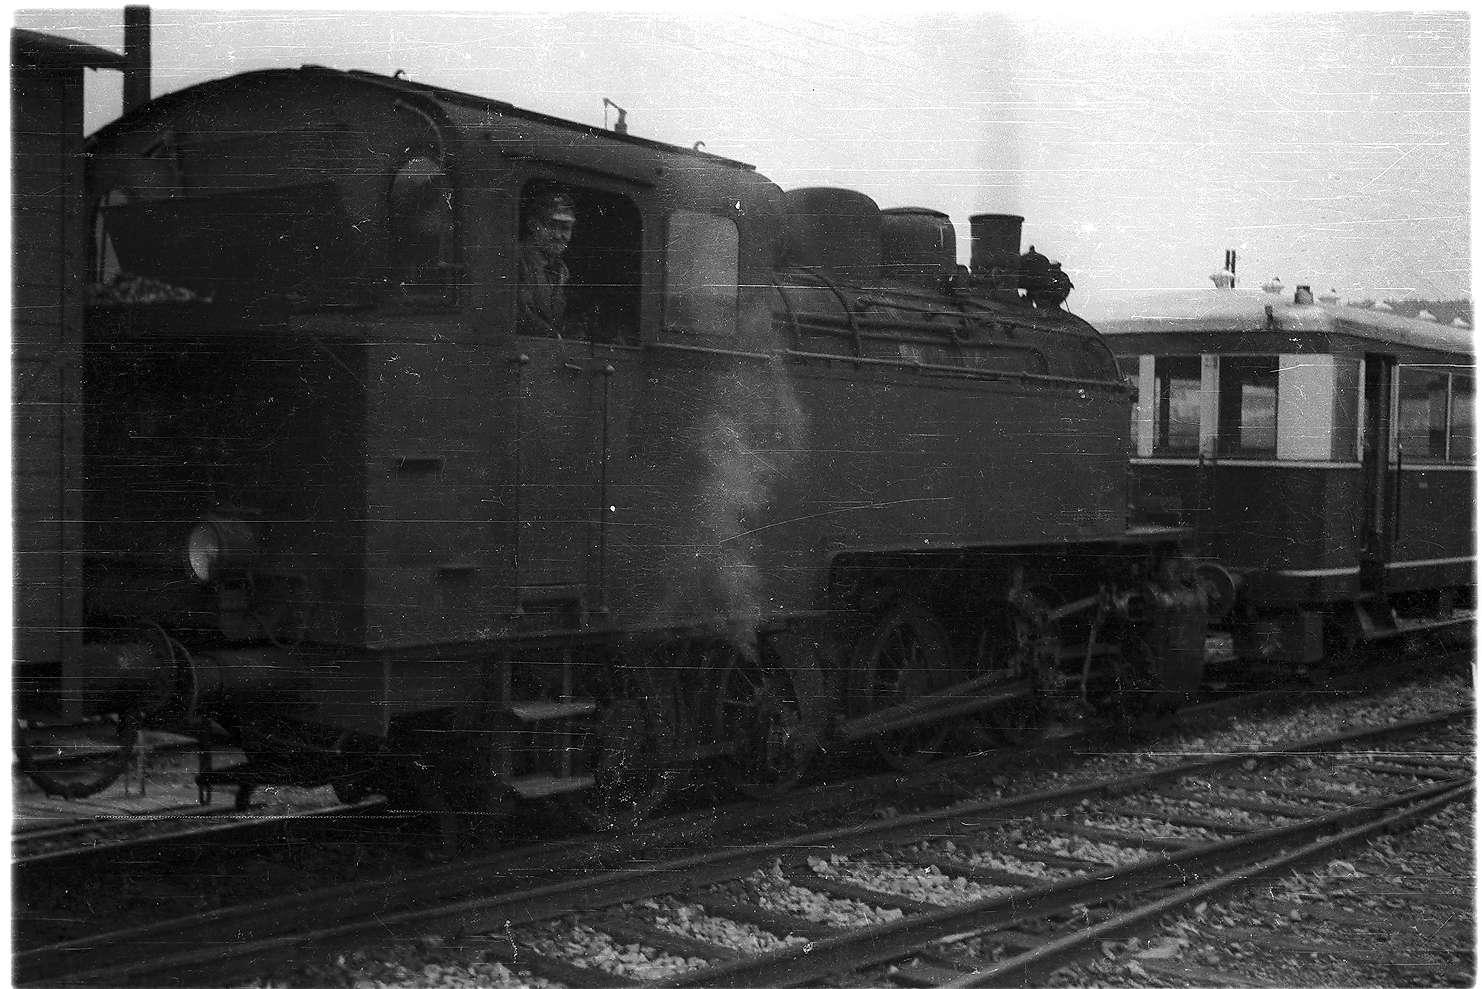 Gammertingen, Lok 16, erbaut 1928 bei AEG Berlin, Bild 1